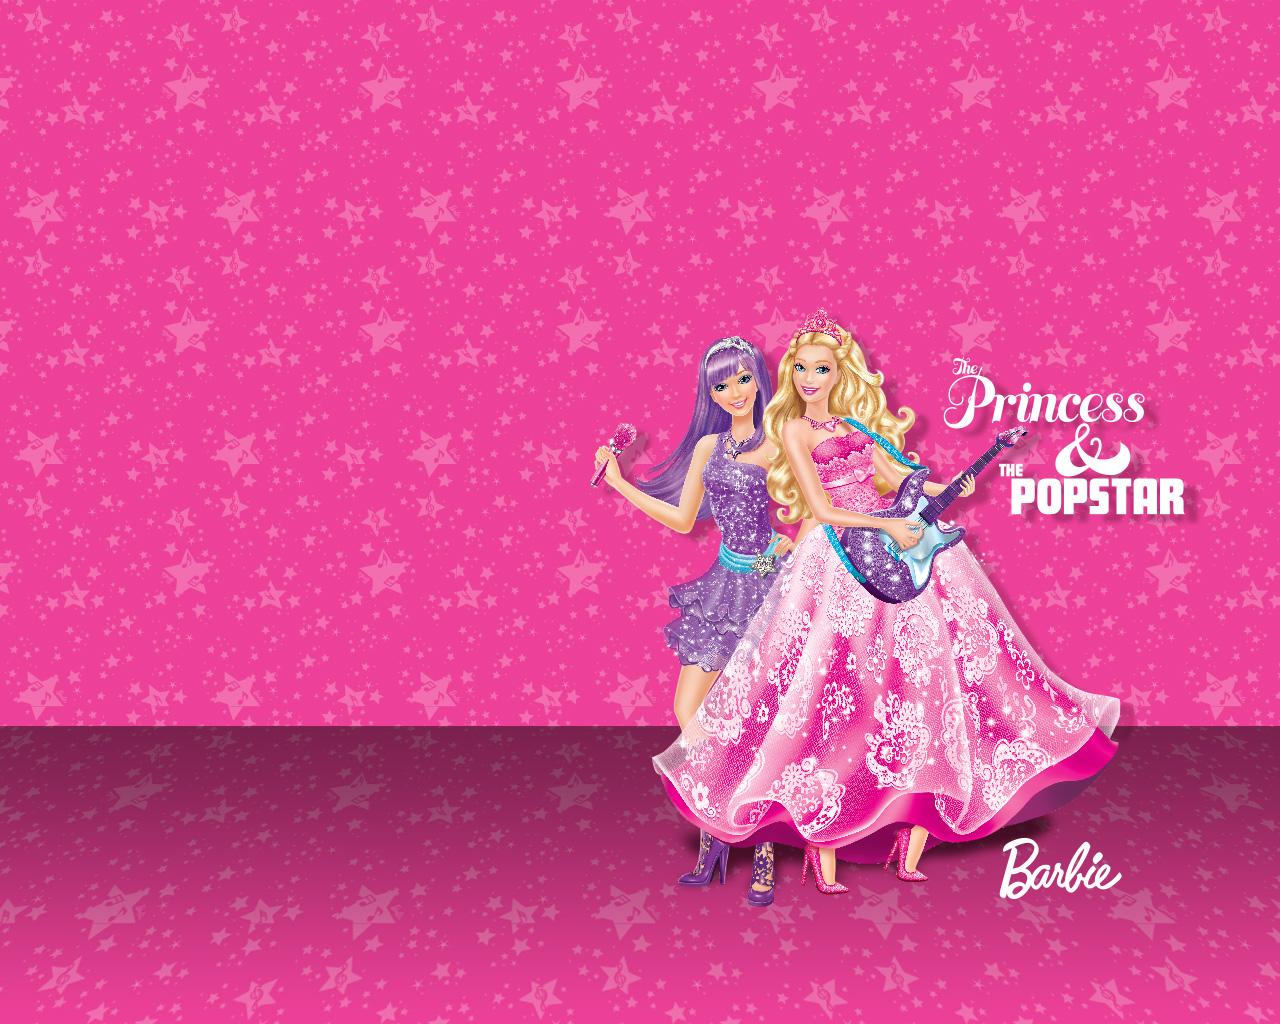 Alizee Wallpaper Hd Pink Princesa Amp Pop Star Barbie Barbie